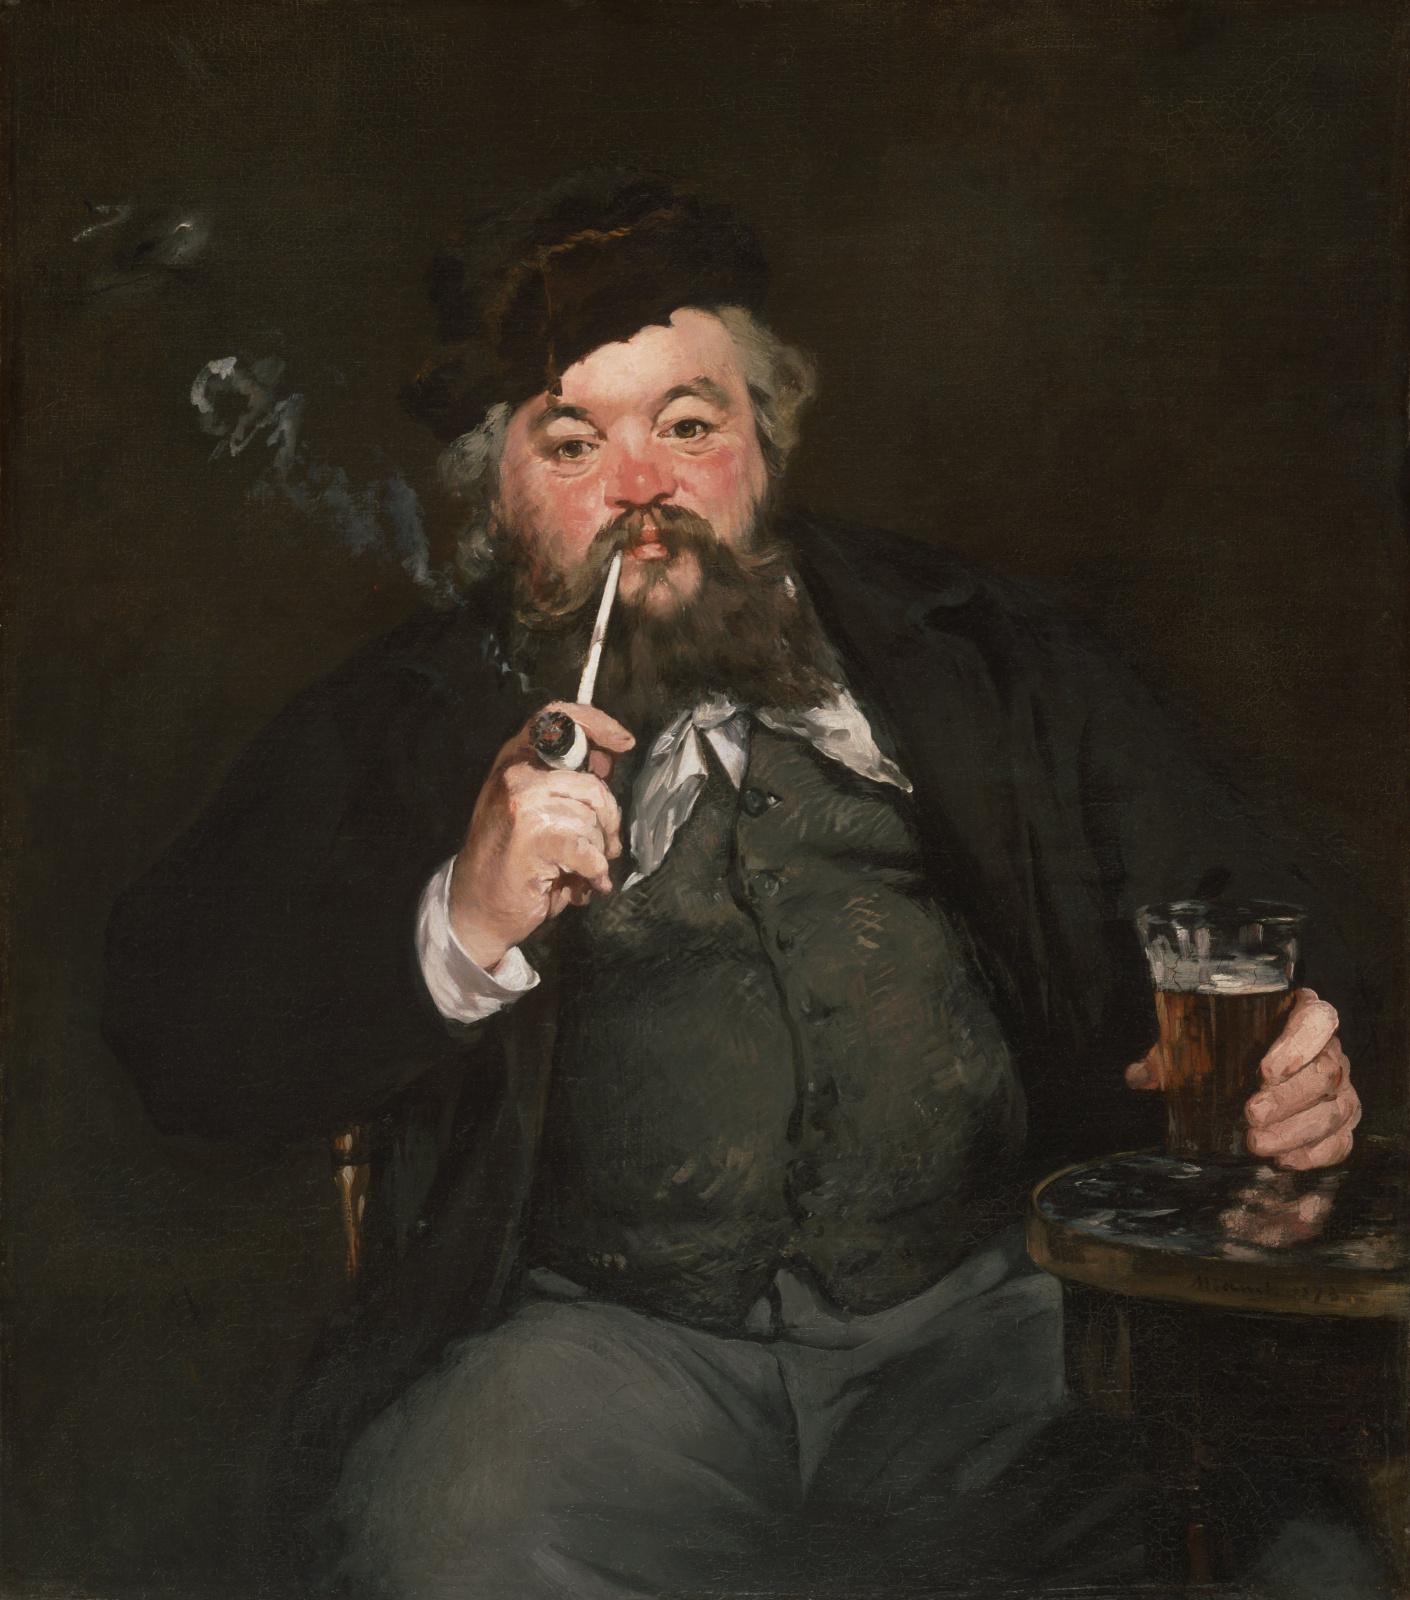 Эдуар Мане. Хороший стакан пива